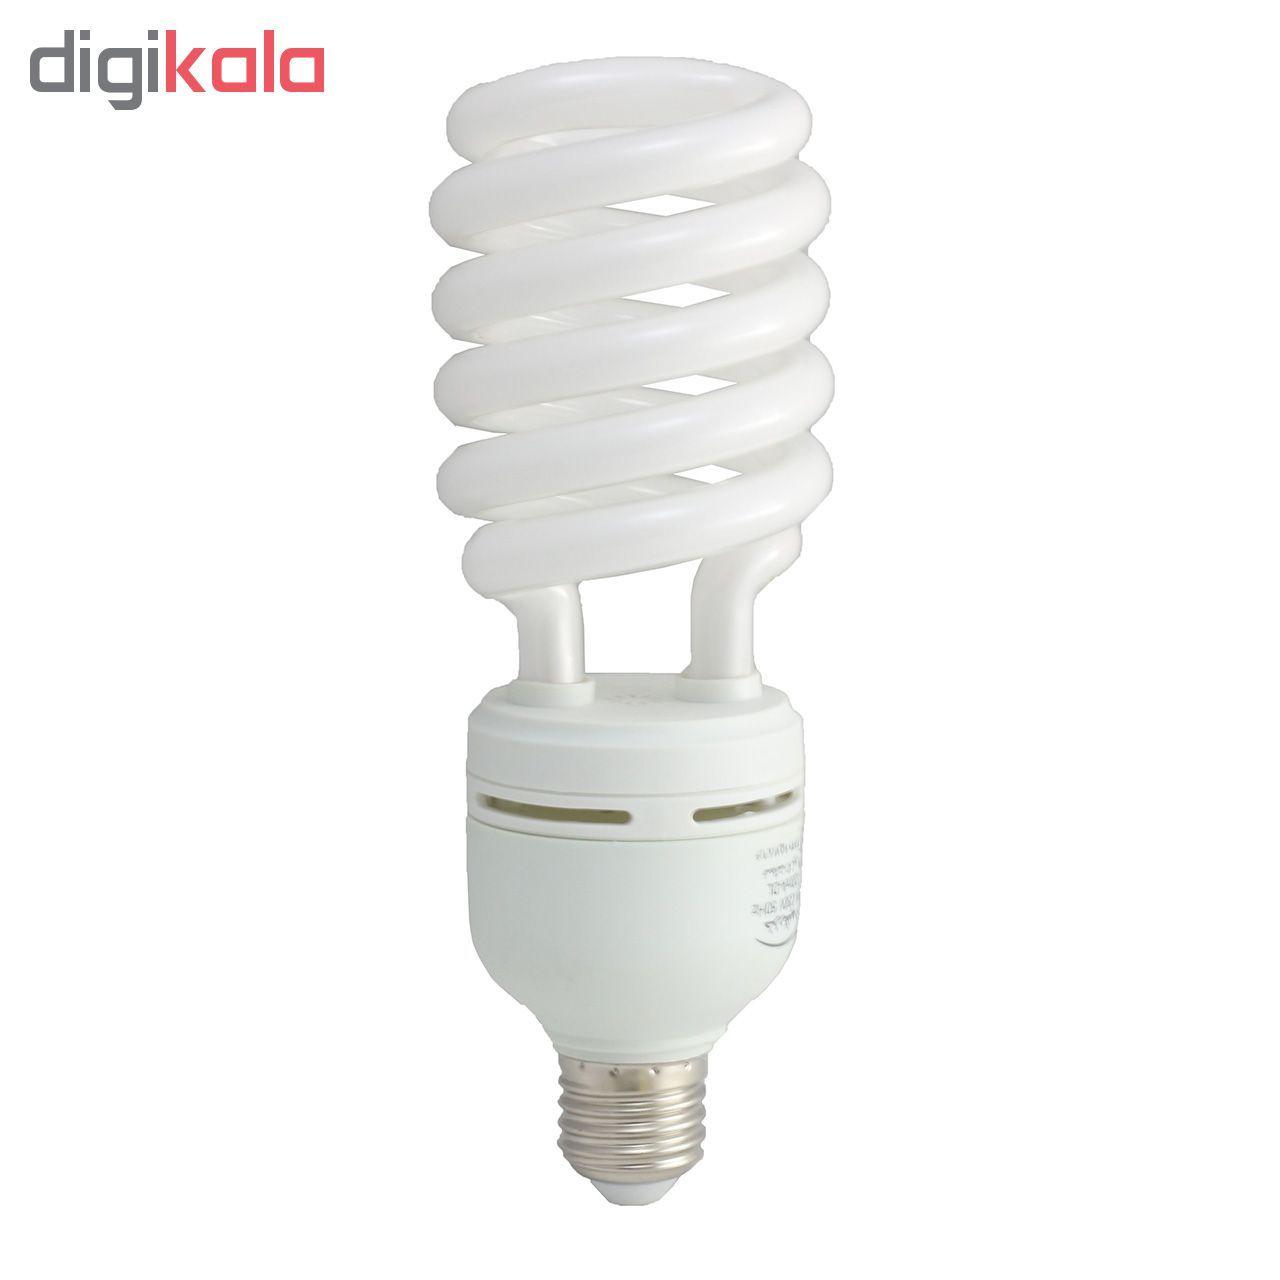 لامپ کم مصرف 25 وات خزرشید مدل HS پایه E27 main 1 1